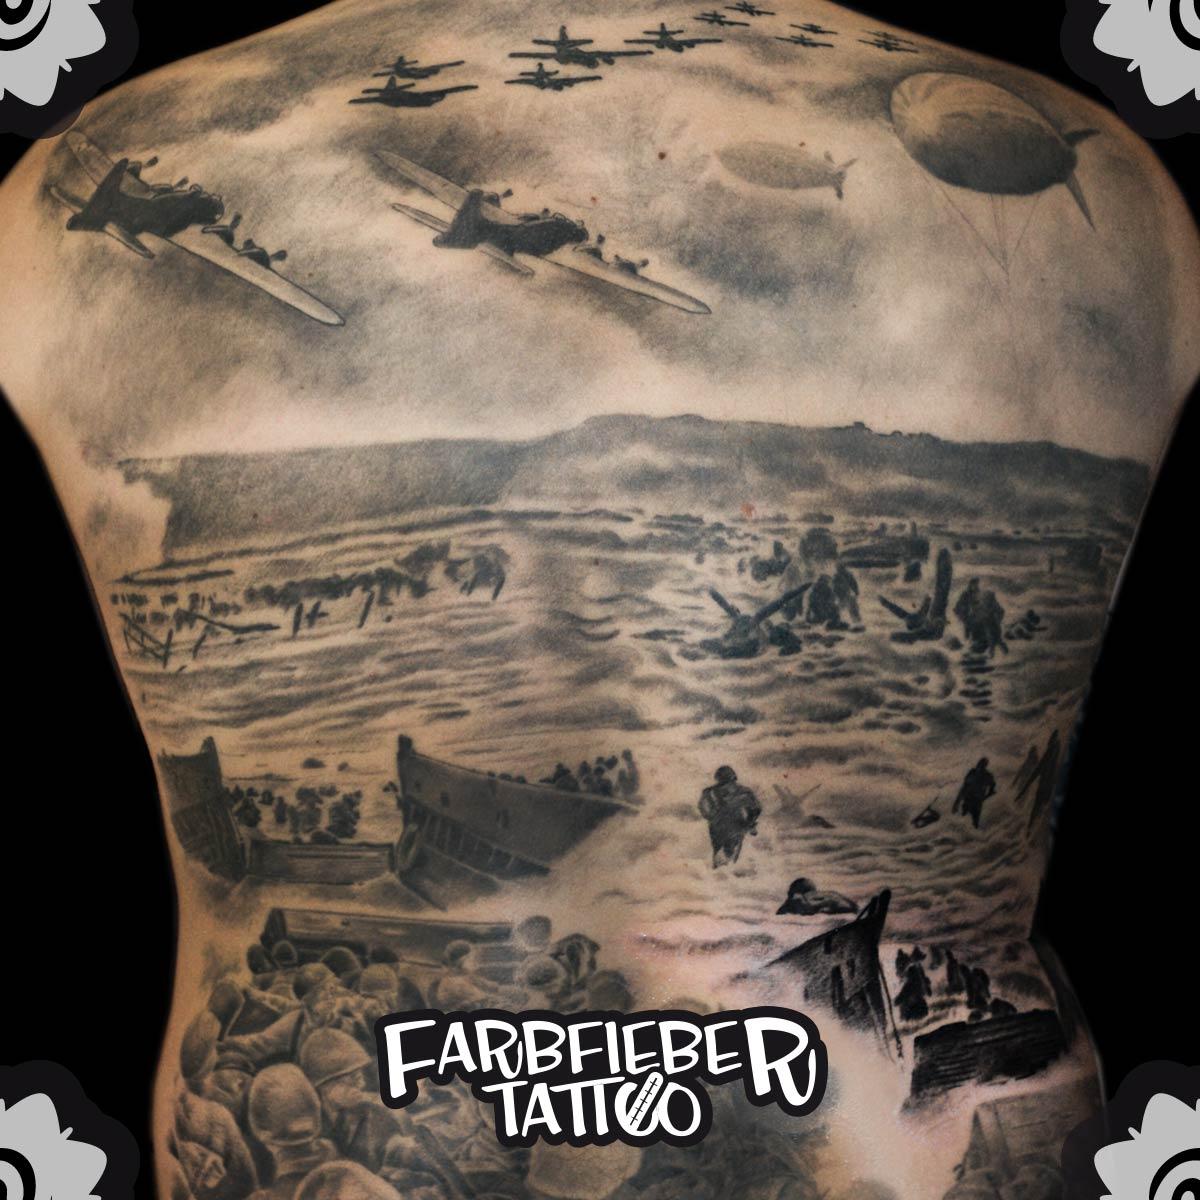 roland-farbfieber-tattoo-d-day